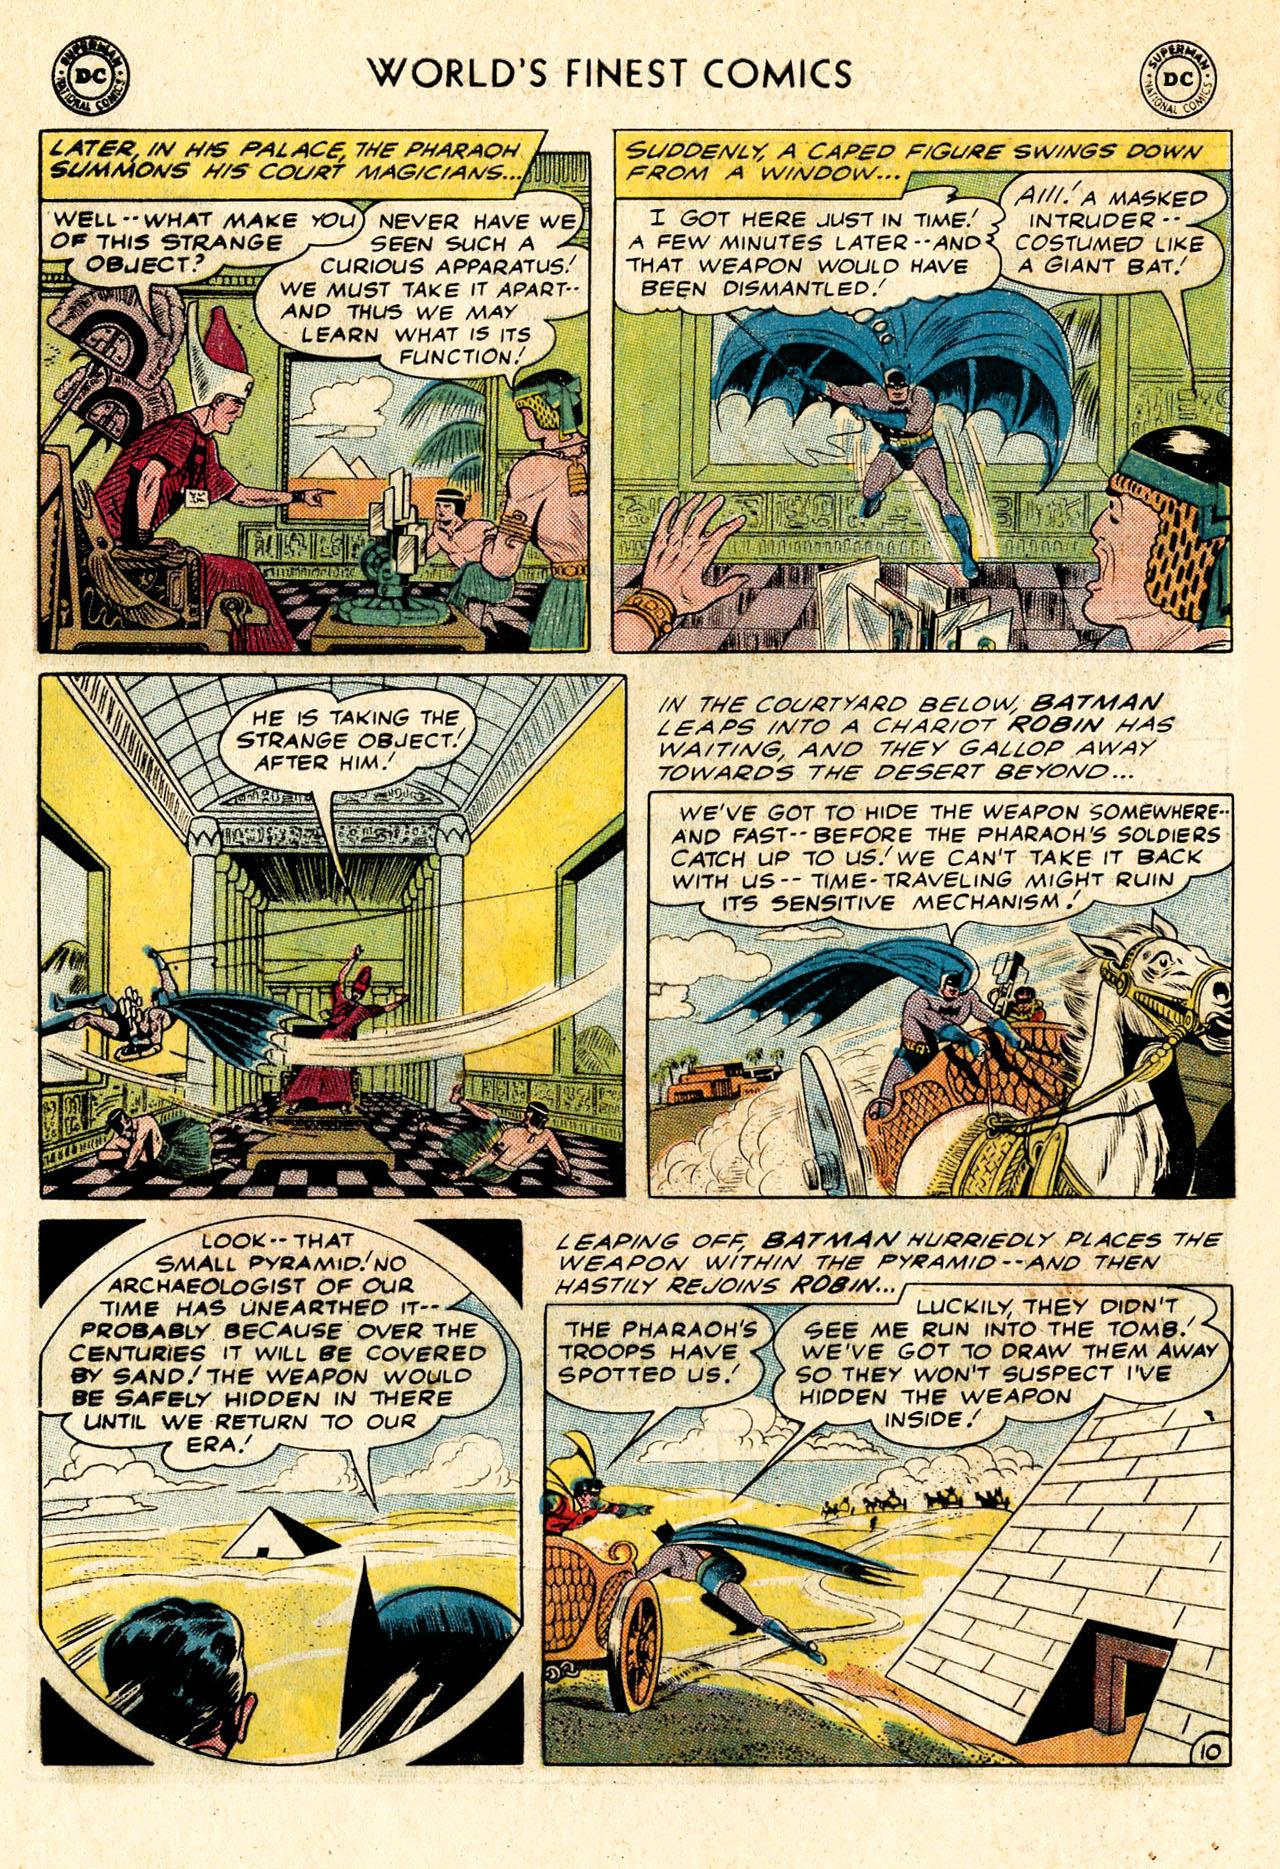 Read online World's Finest Comics comic -  Issue #107 - 12